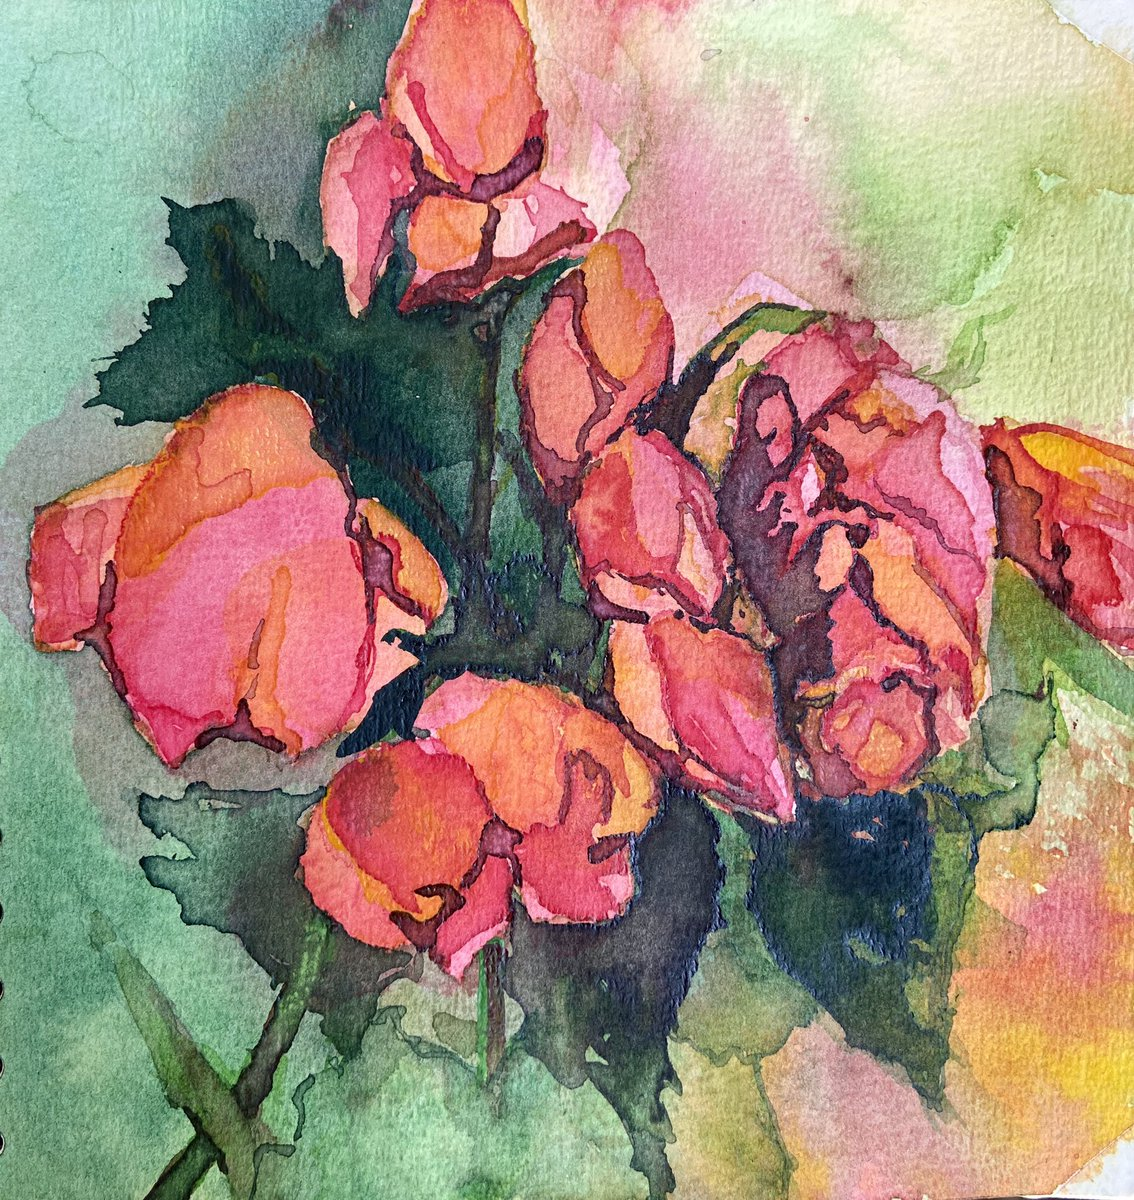 Roses I #roses #rosas #flowers #fleurs #mygarden #monjardin #jardin #garden #instart #sketch #aquarelle #watercolor #acuarela #arte #art #gardenartpic.twitter.com/NPbeNb9Ucr